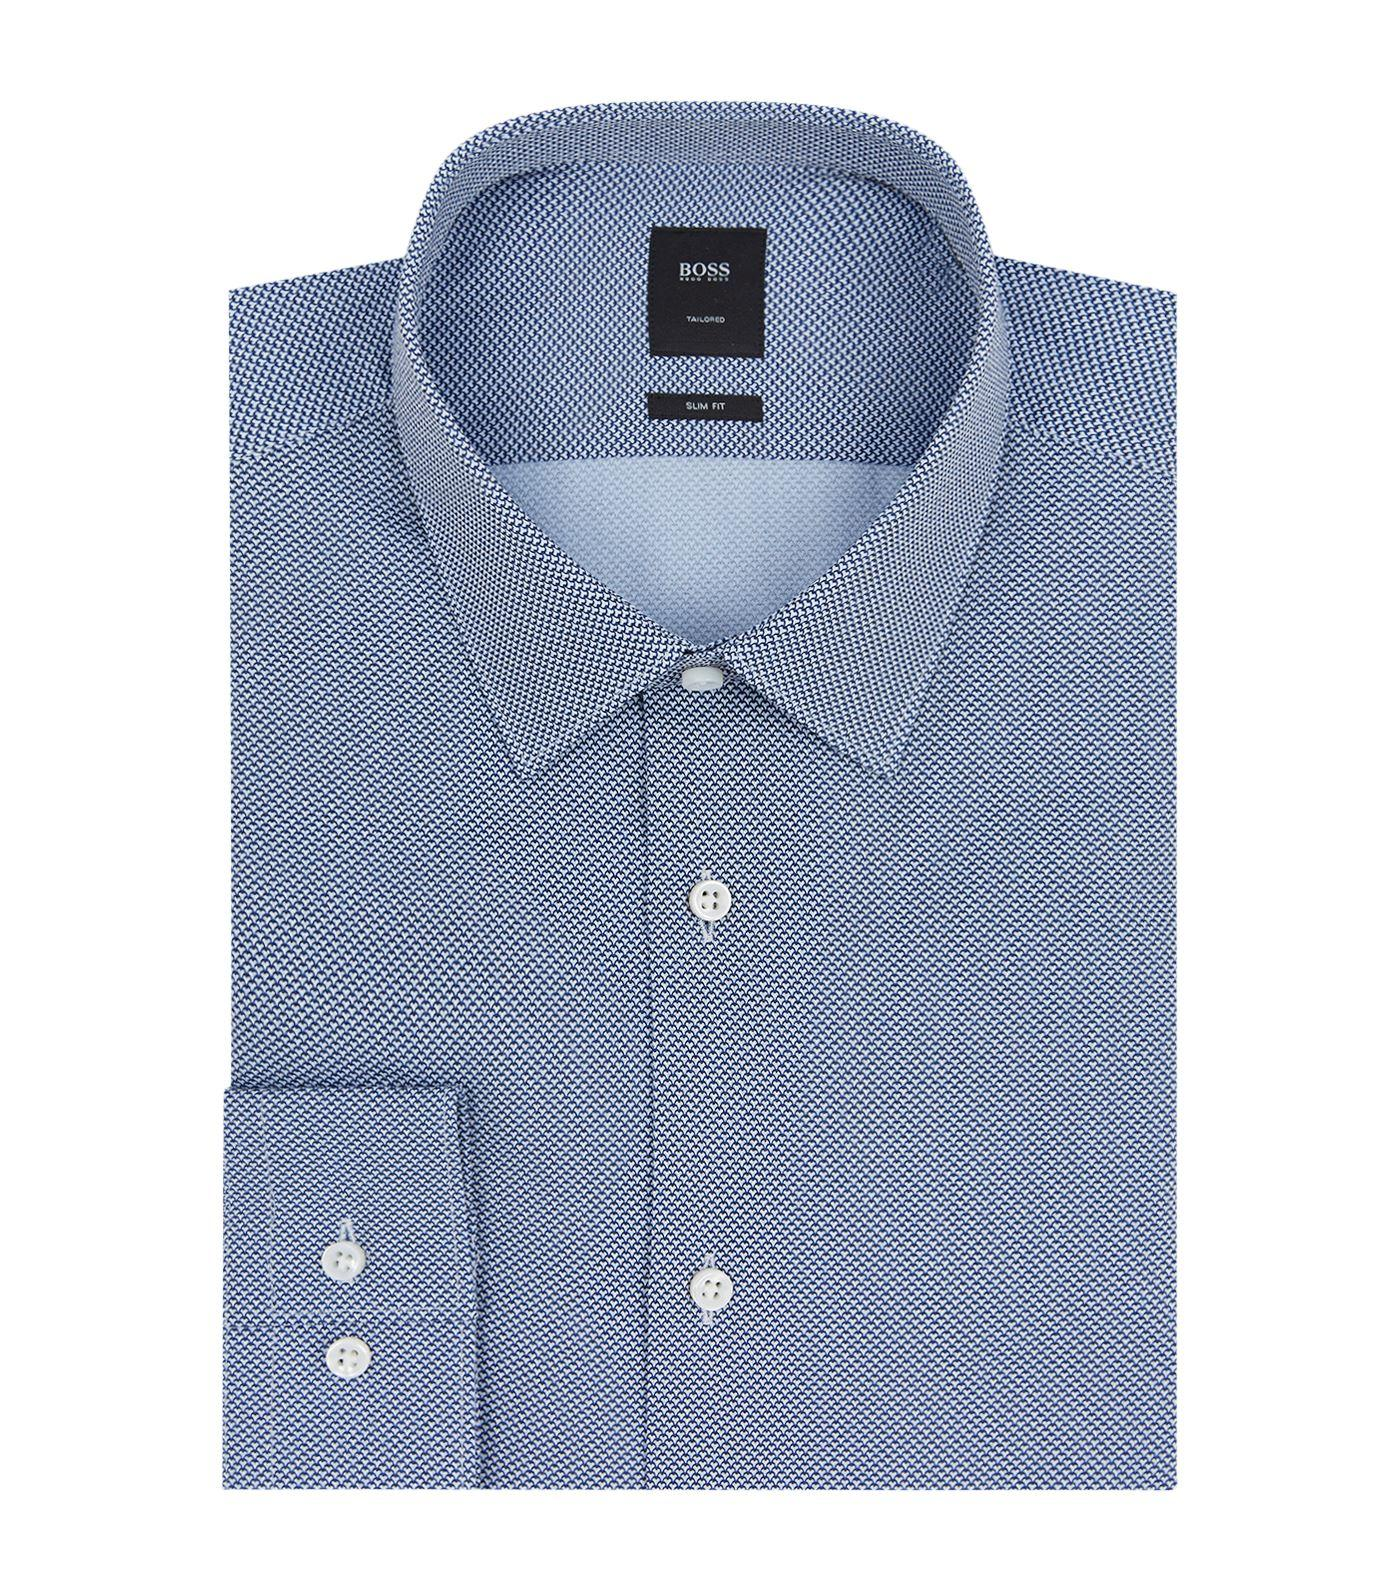 14a3f96dc Hugo Boss Slim Fit Cotton Shirt In Blue | ModeSens